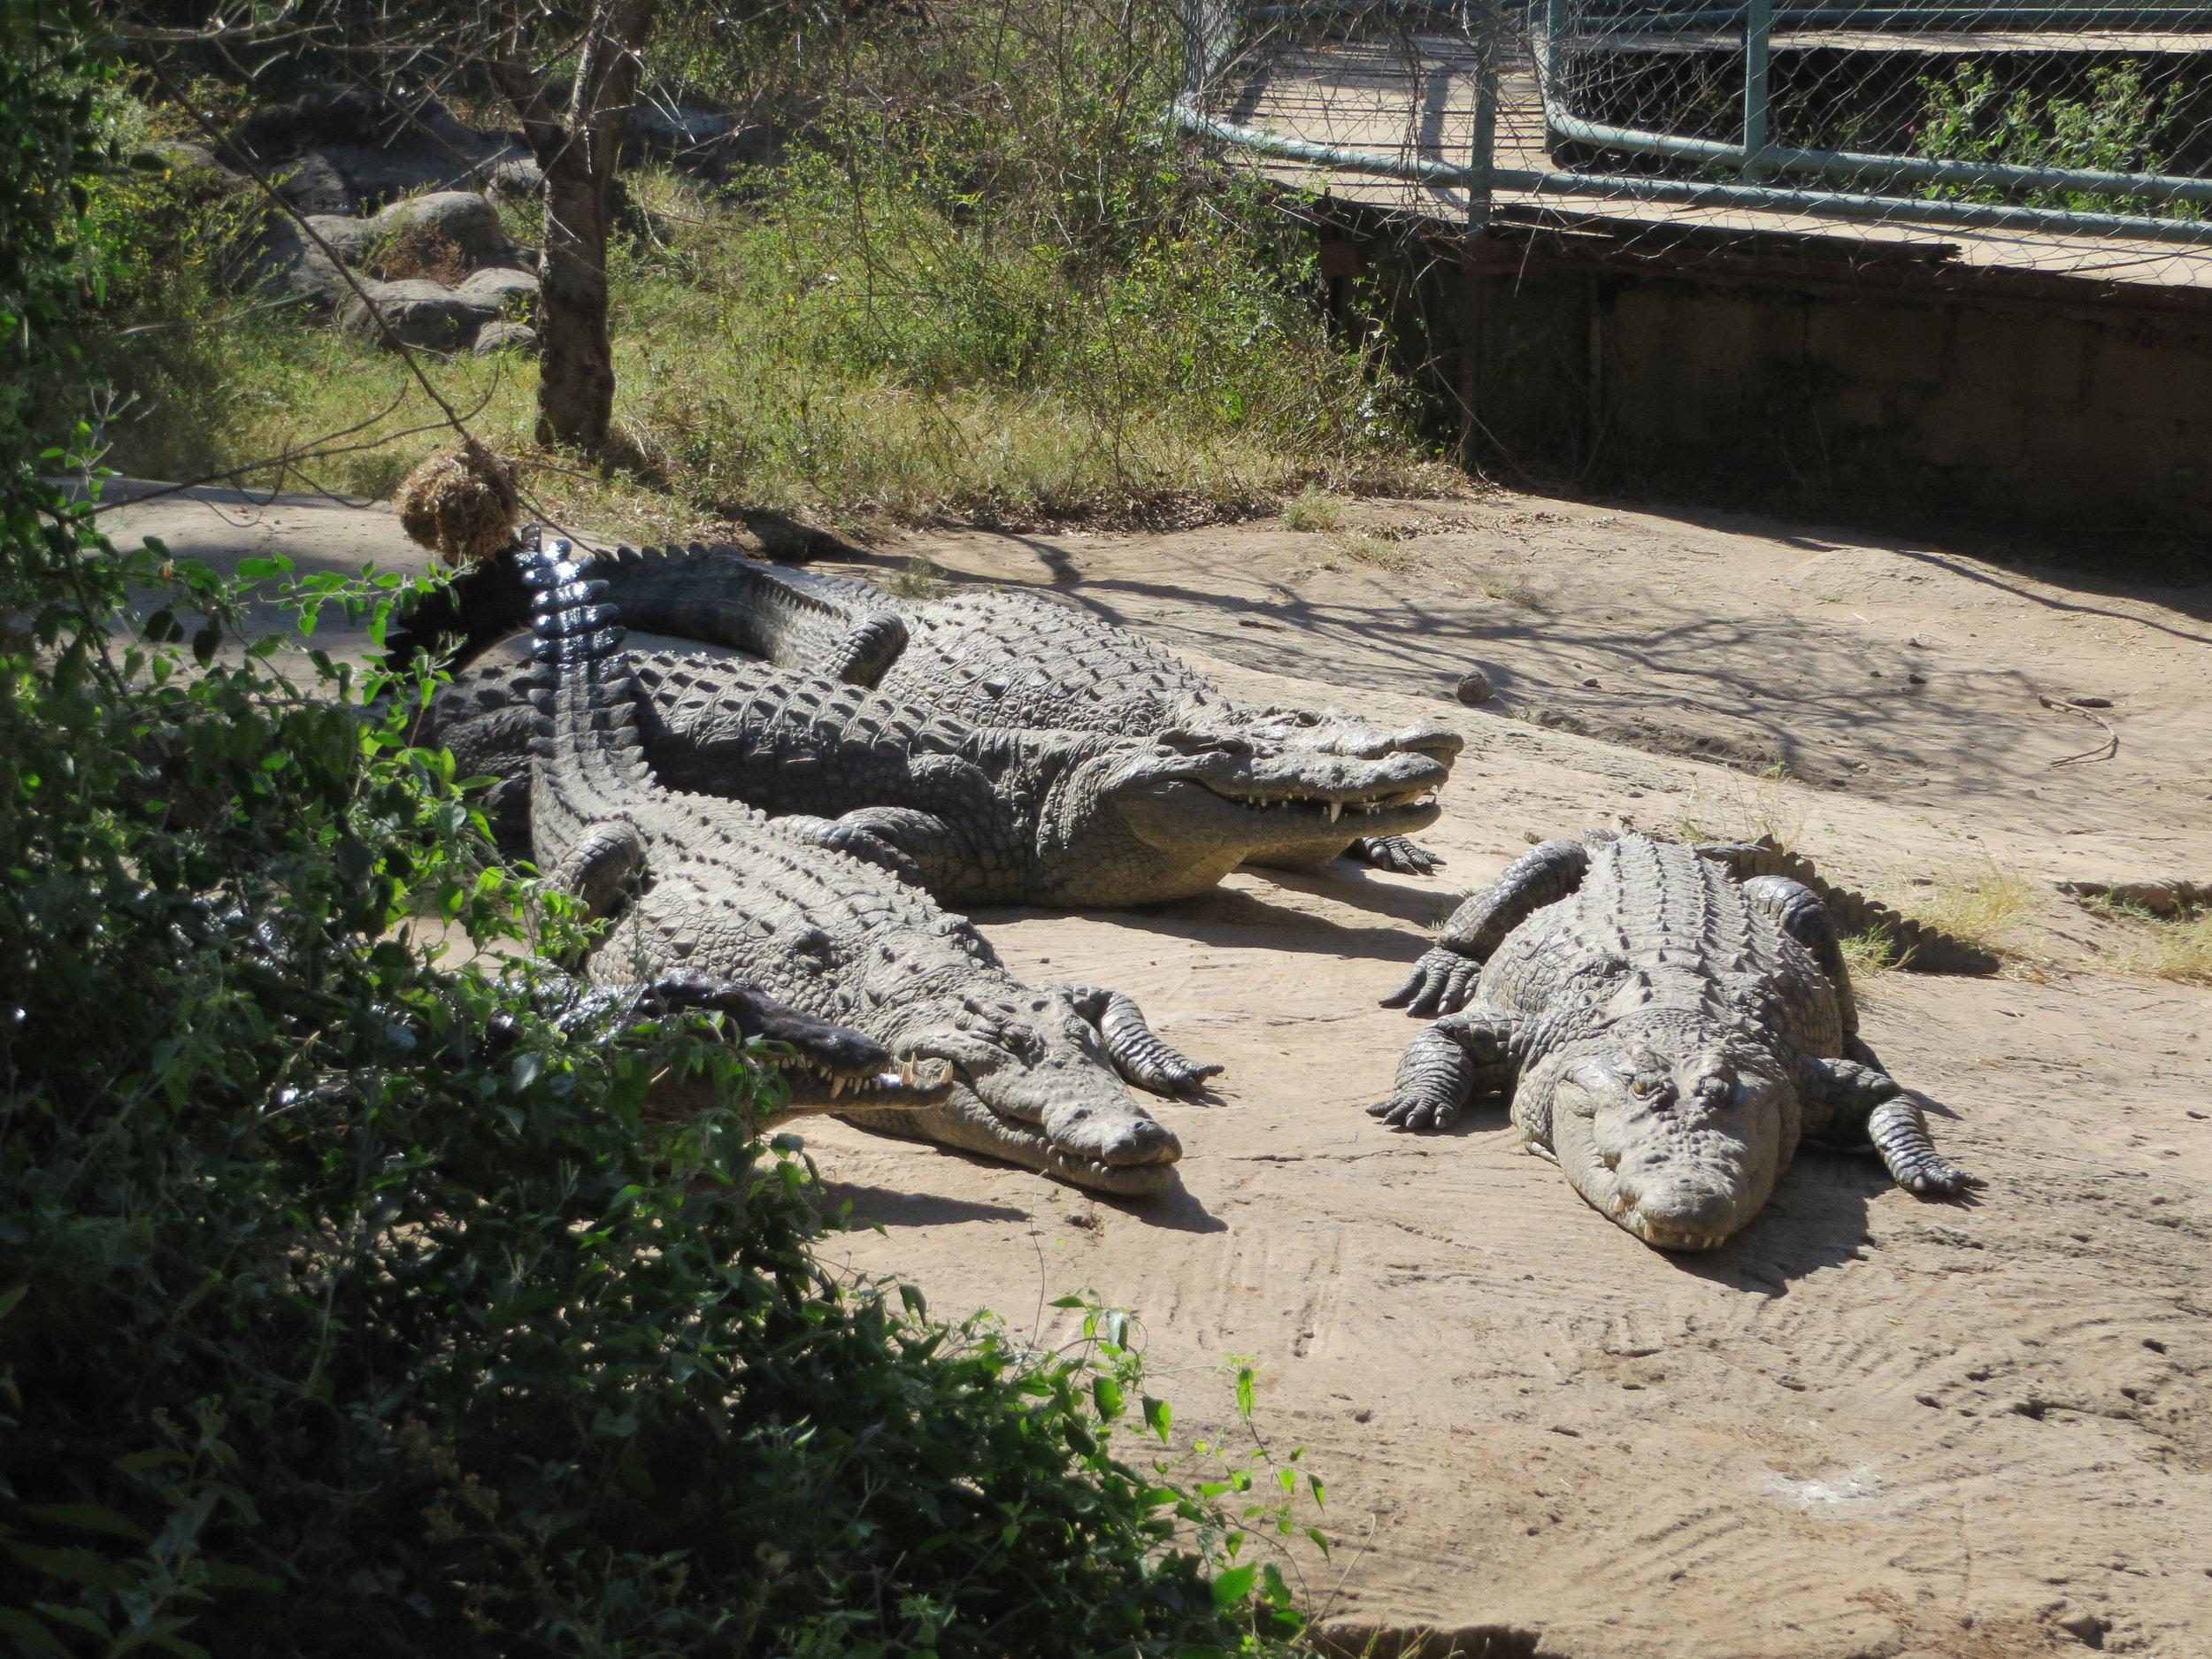 Livingstone crocodile and snake farm